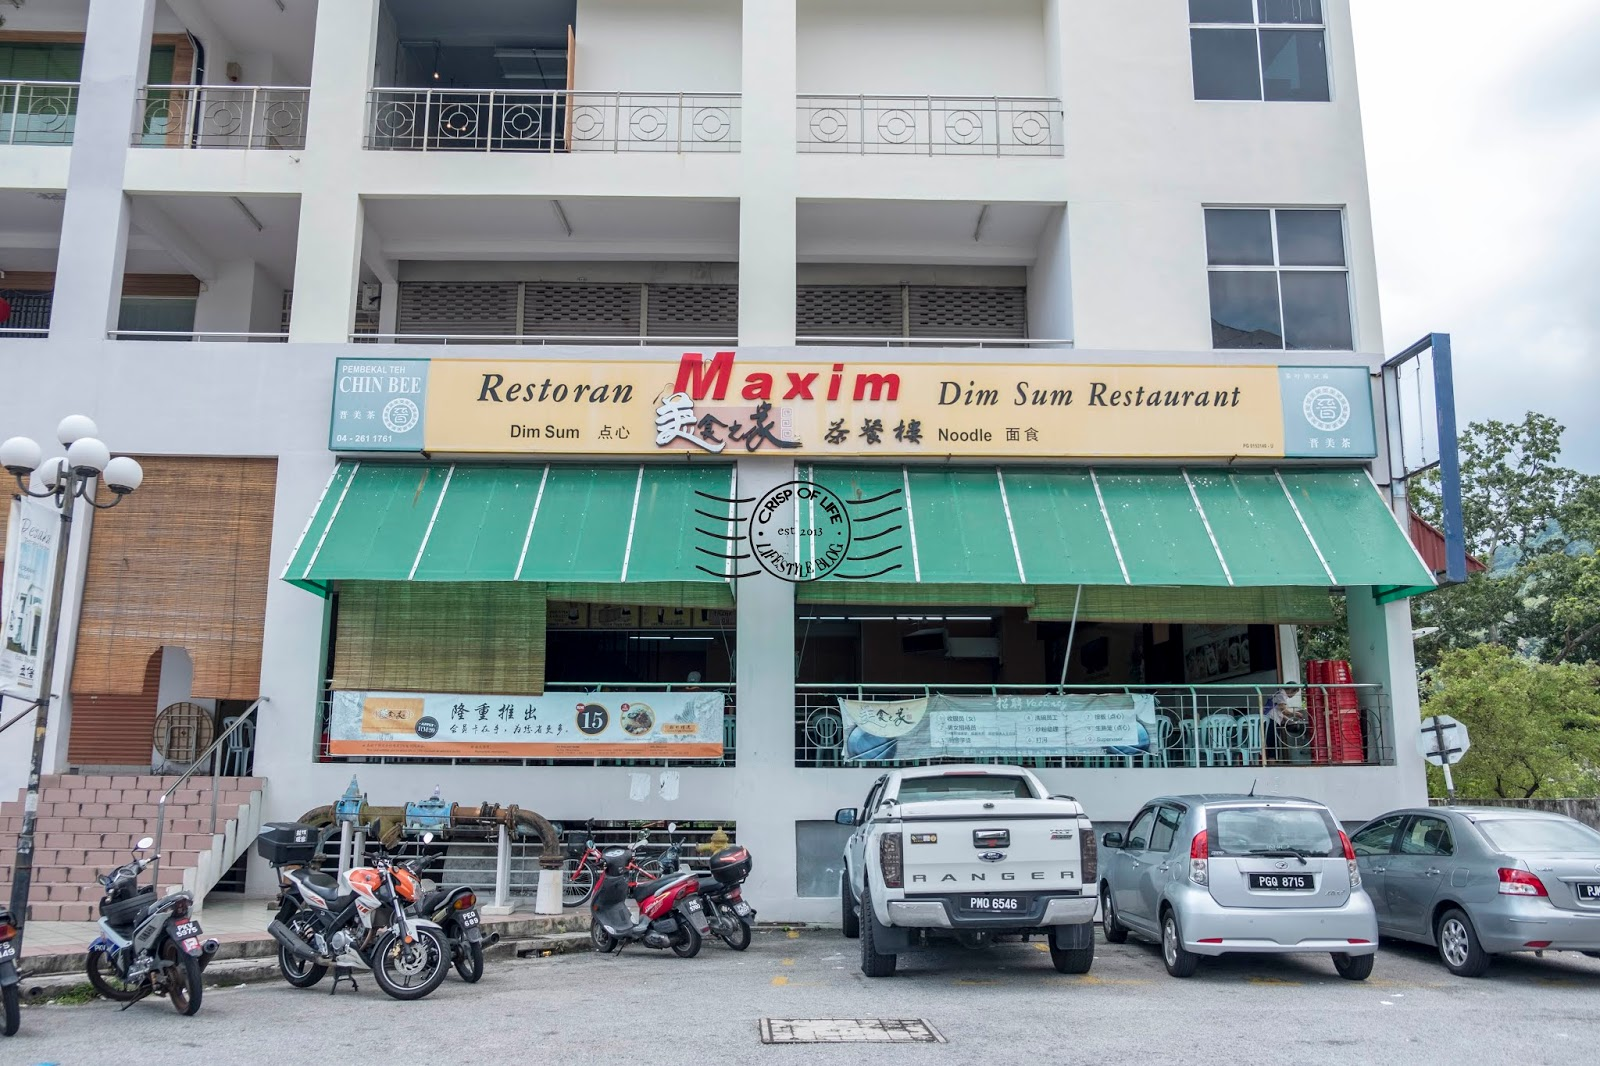 Maxim Dim Sum Restaurant at Taman Pekaka, Penang